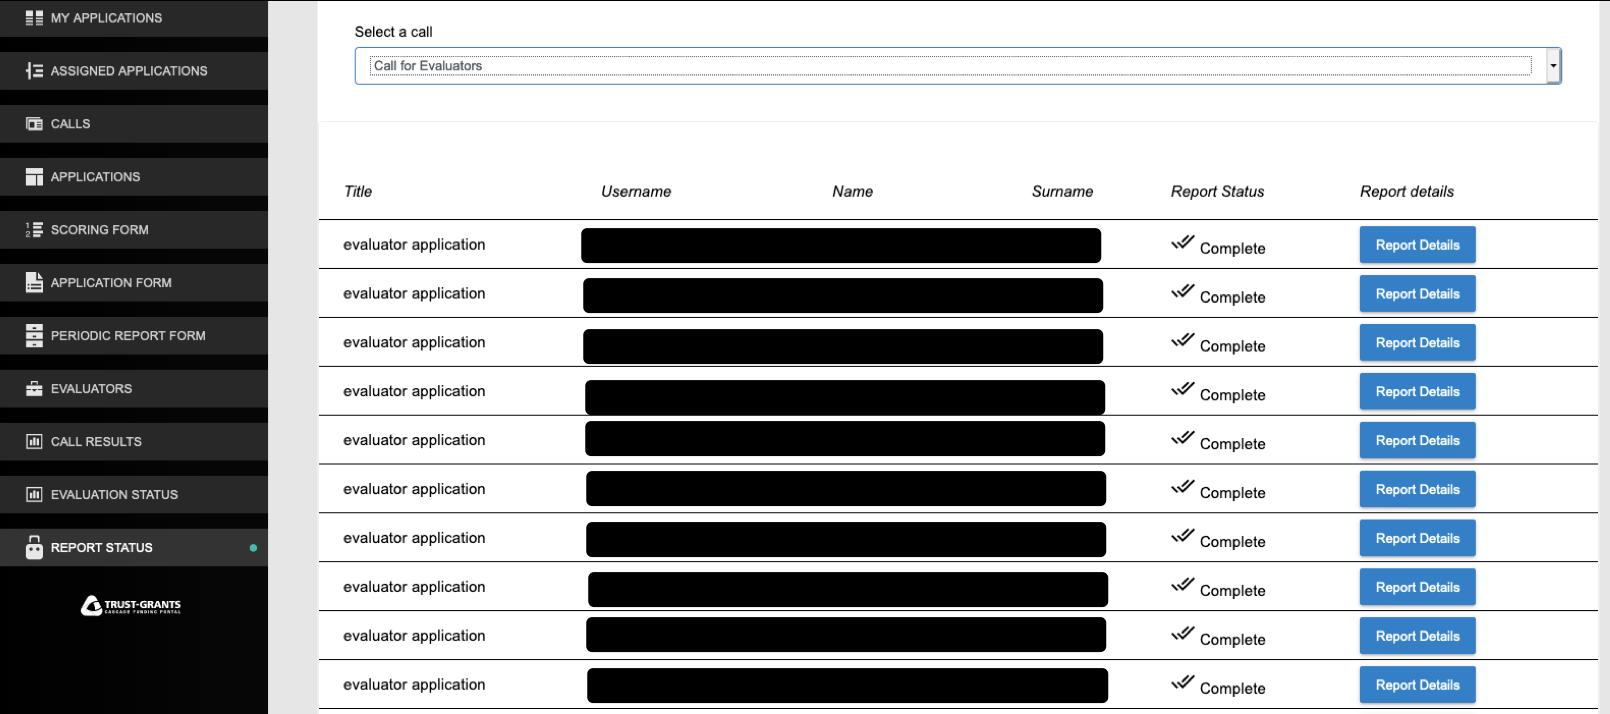 Trust-IT Grants Plaftorm - Monitoring Reporting System